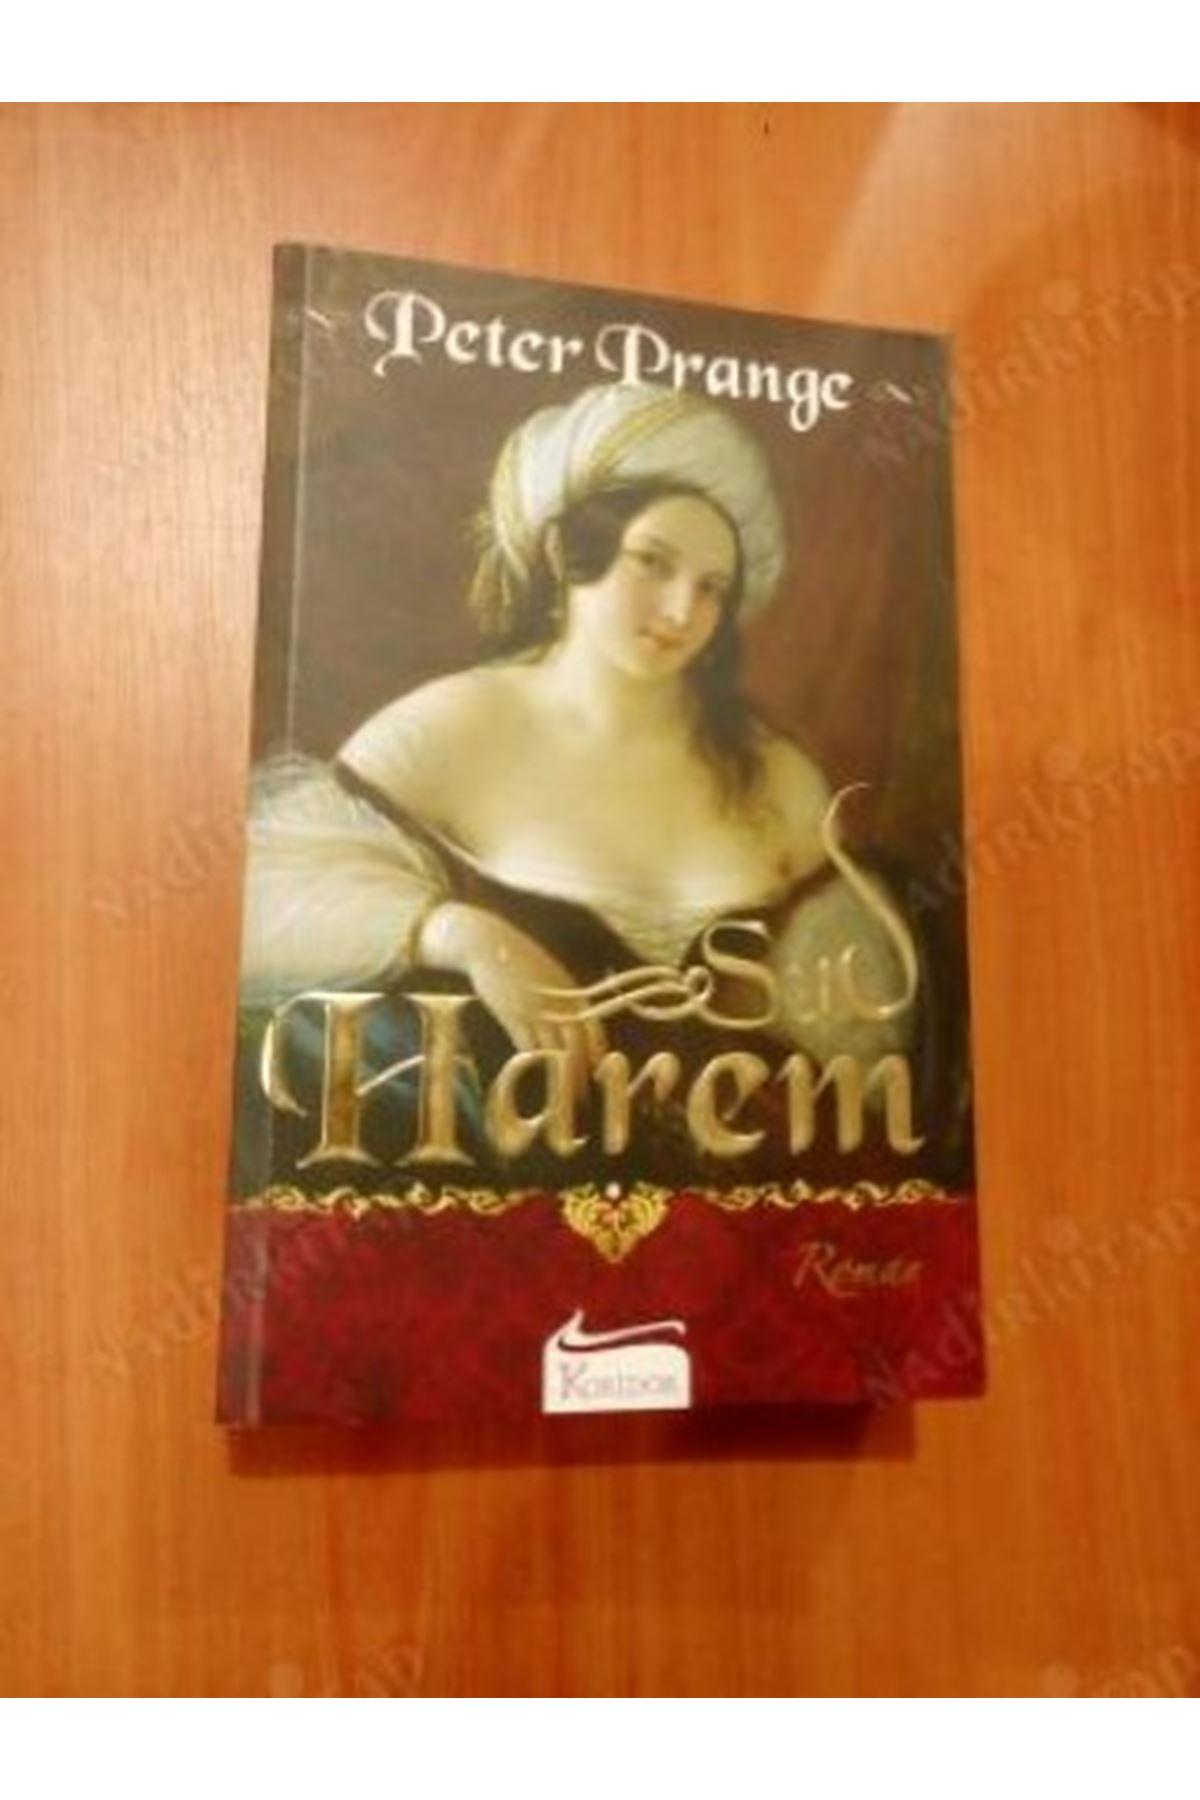 PETER PRANGE - SON HAREM